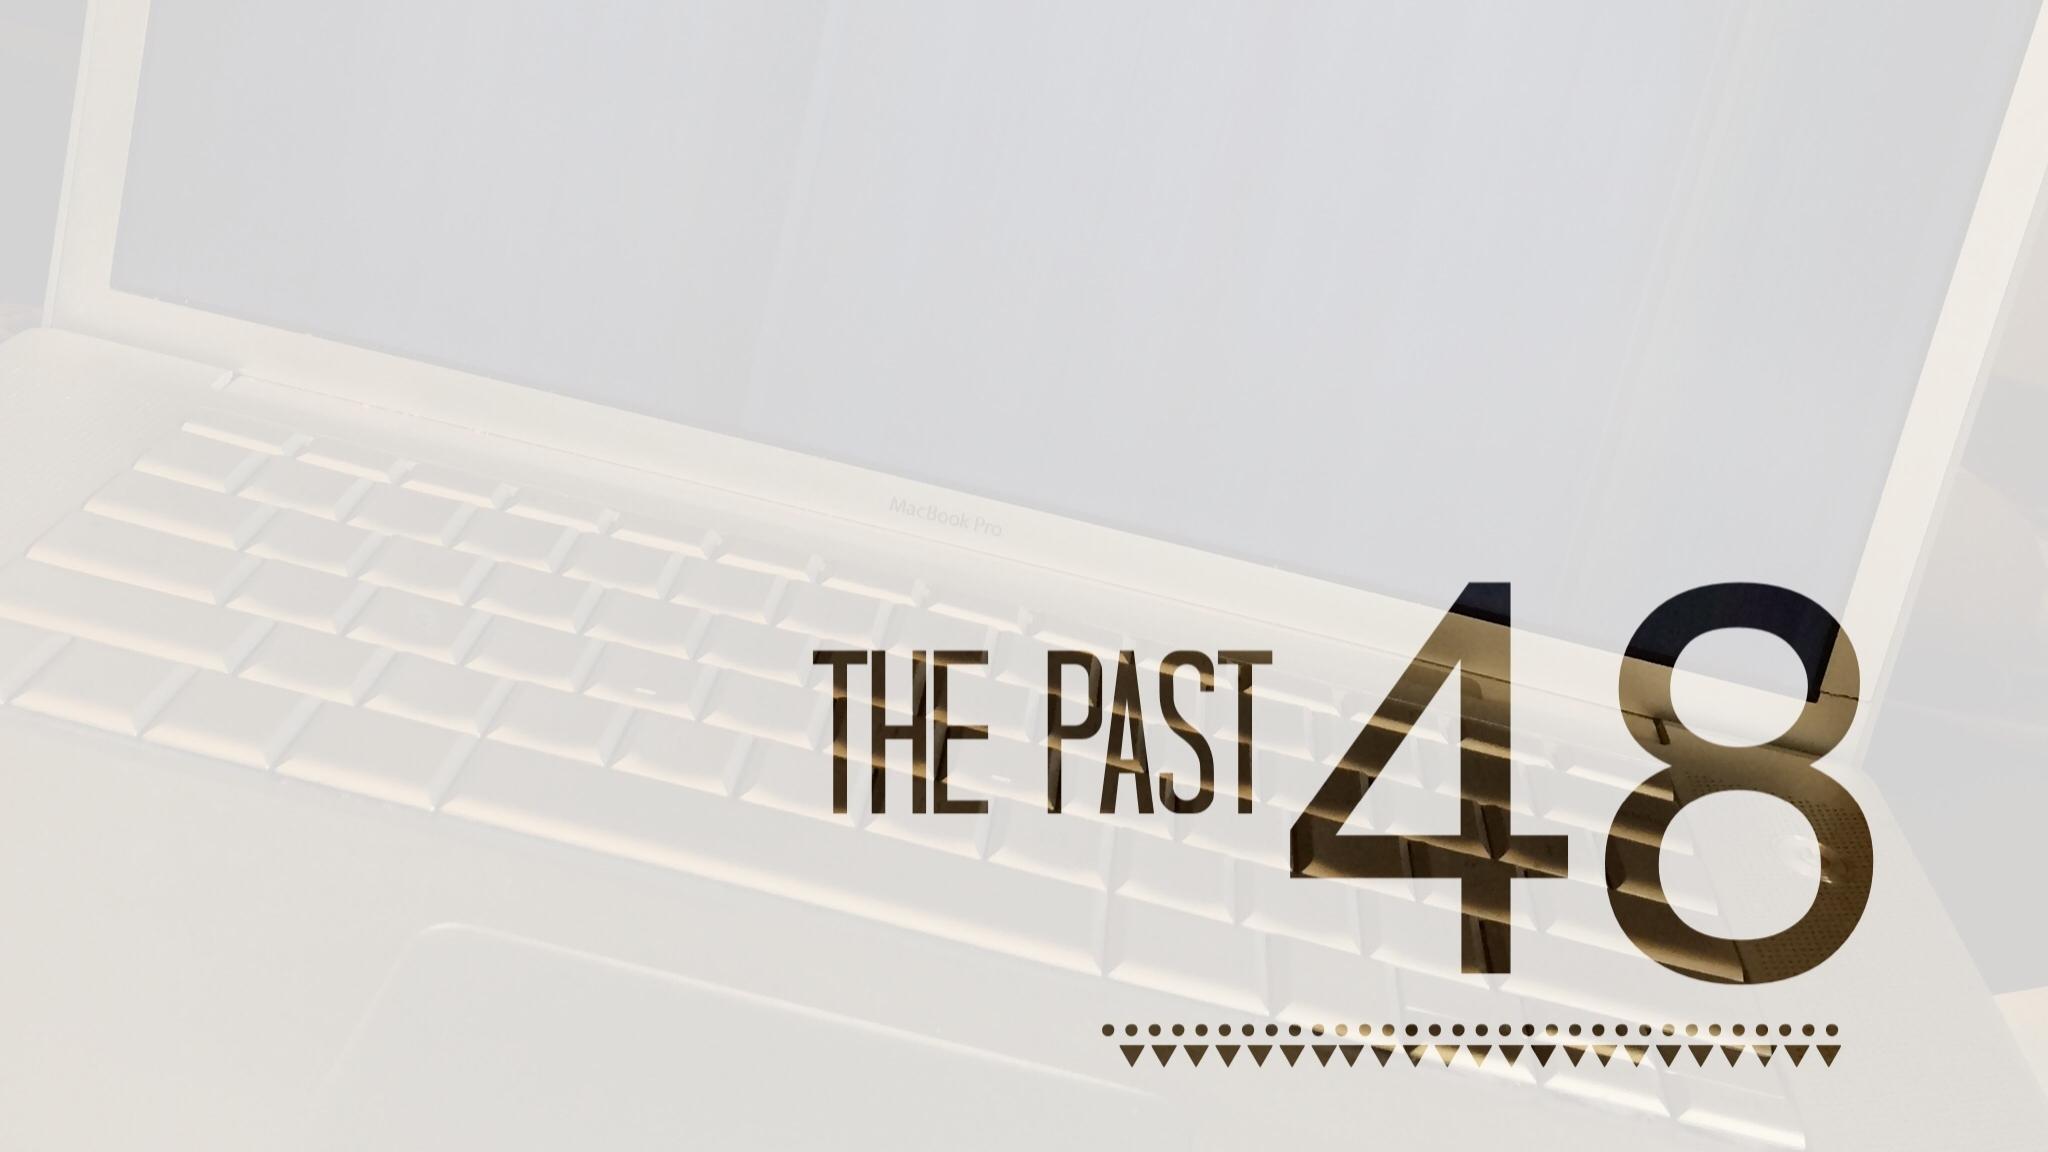 thepast48